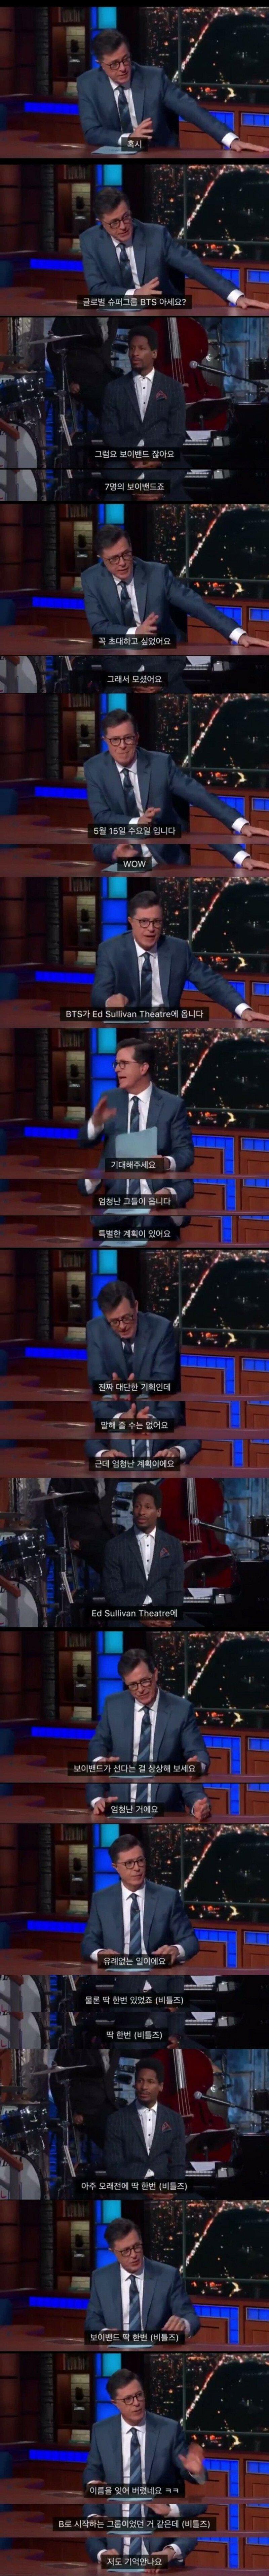 11.jpg 방탄소년단 미국 방송 근황.jpg